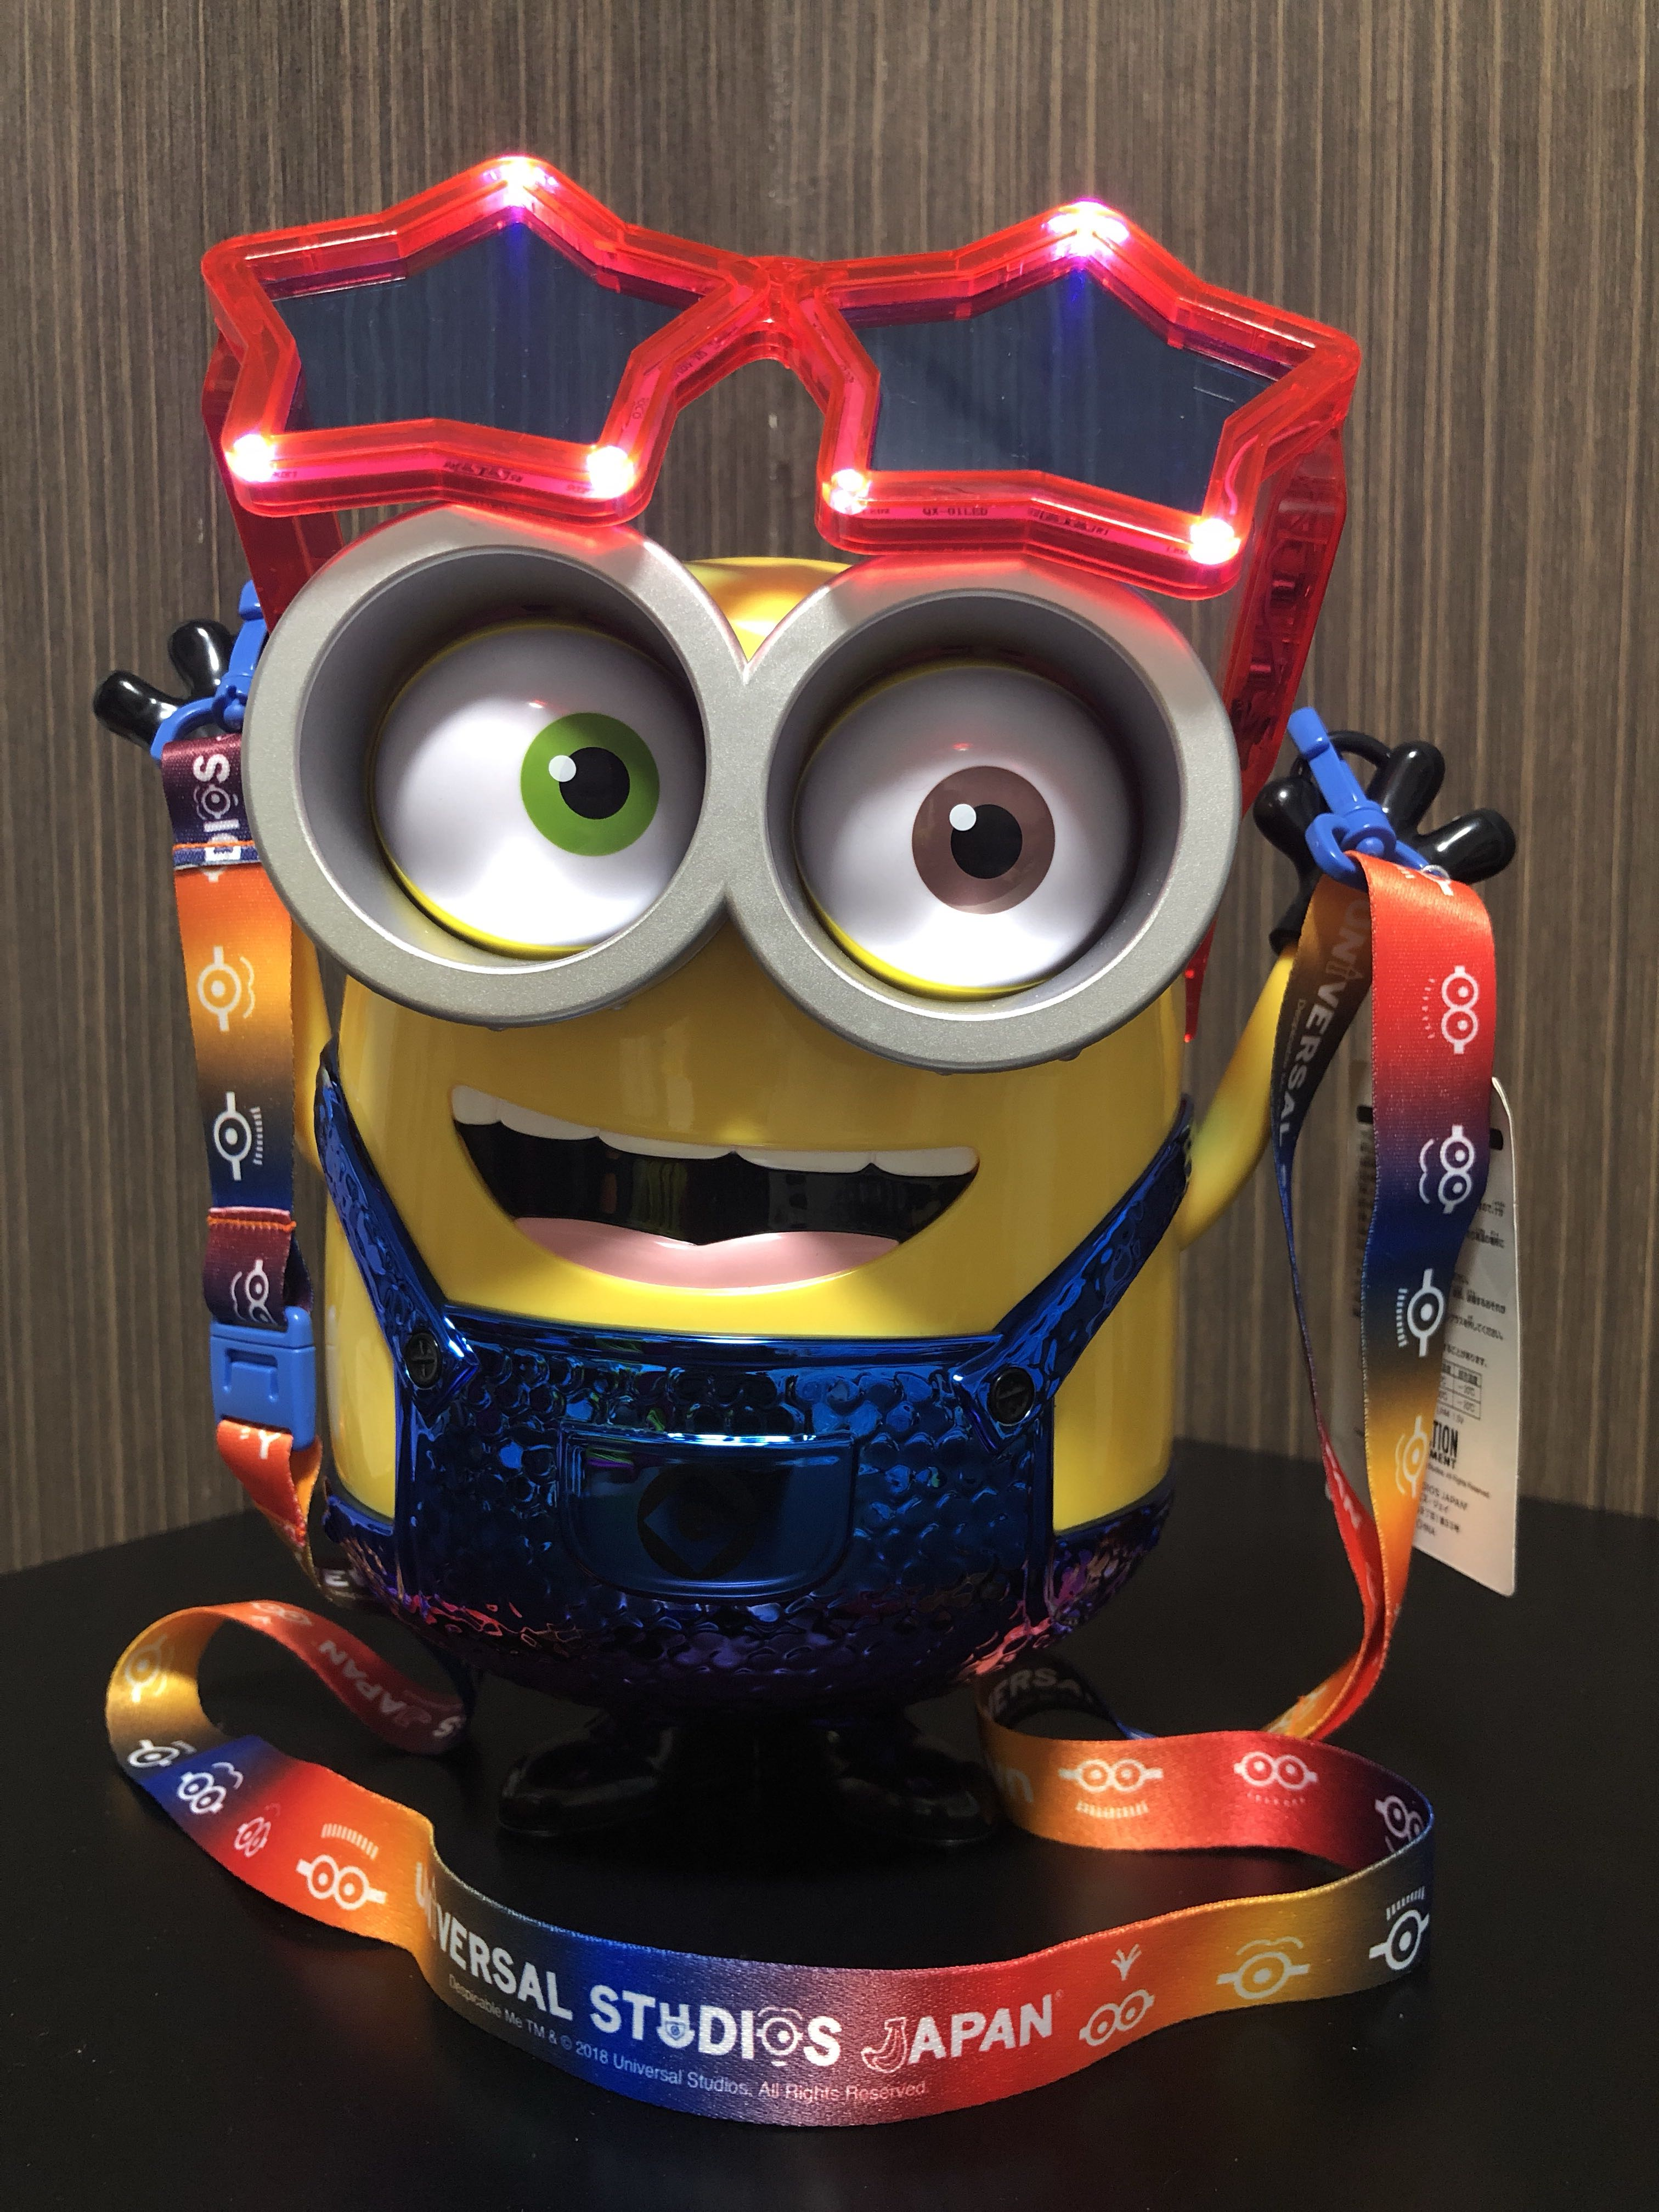 Universal Studios Japan Minion Assorted Plastic Case USJ